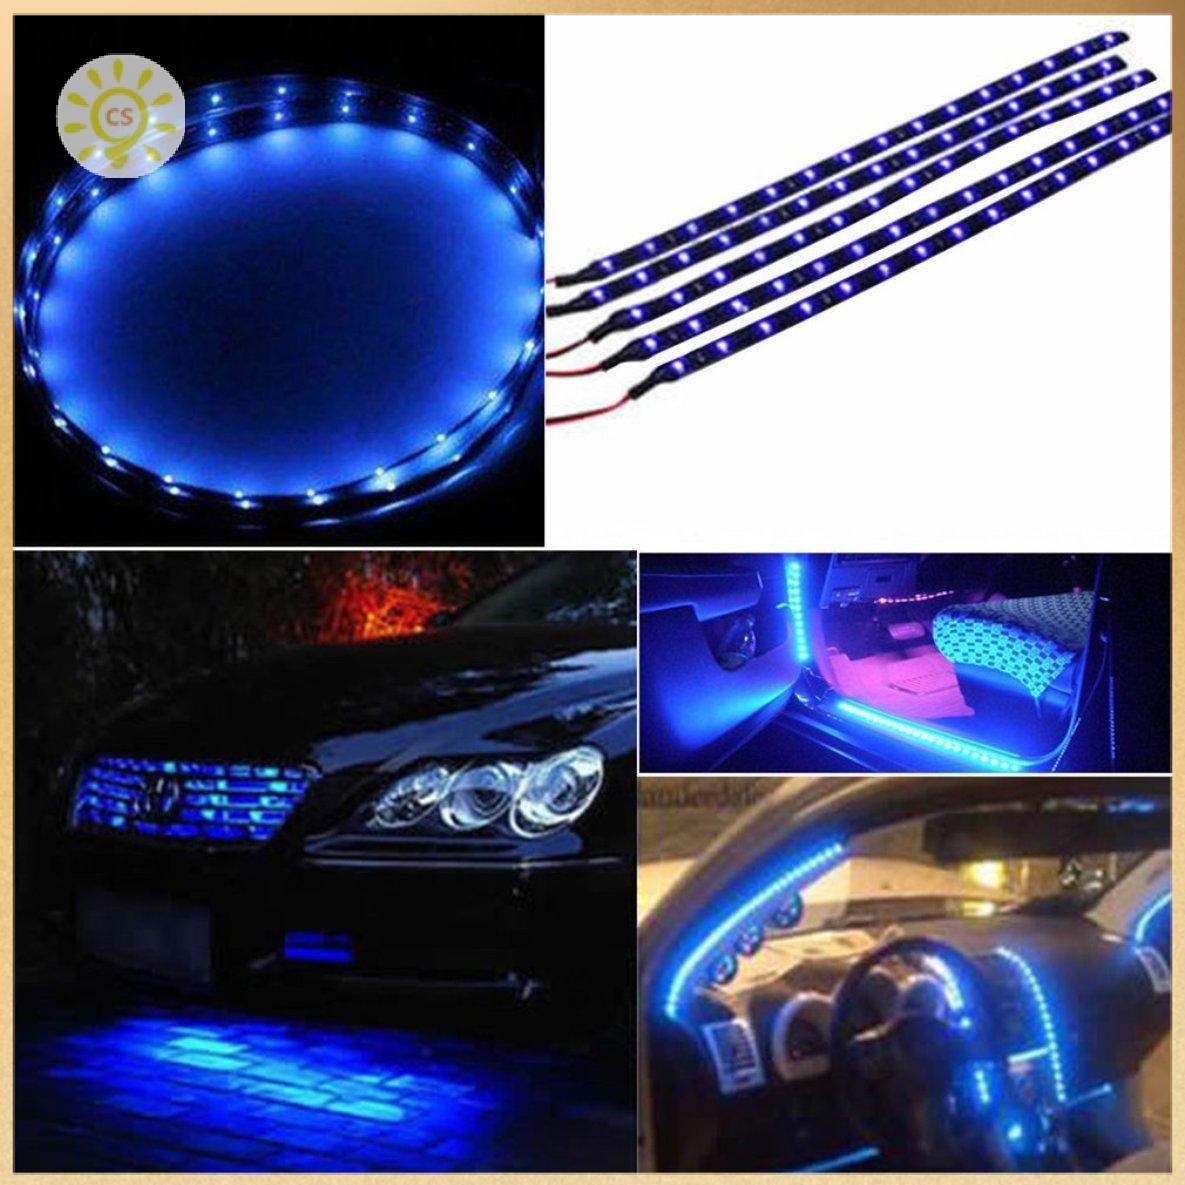 【全館免運】30cm防水15藍色LED汽車車輛電機格柵柔性燈條12V clickstorevip